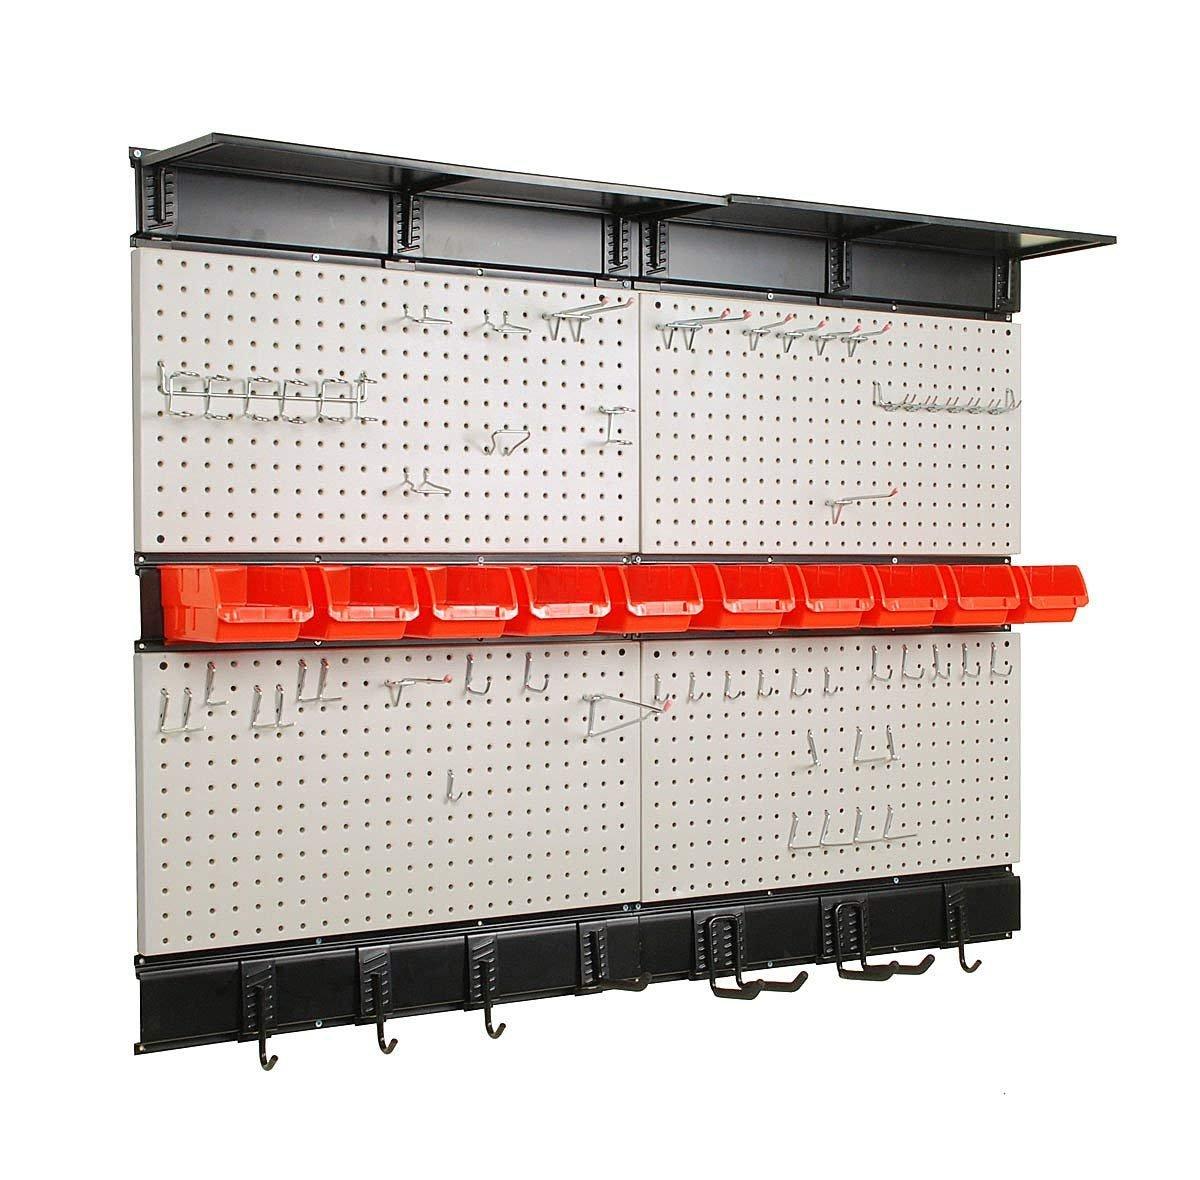 Garage Tools Organizer: Ultrawall Garage Storage, Pegboard With Hooks Garage